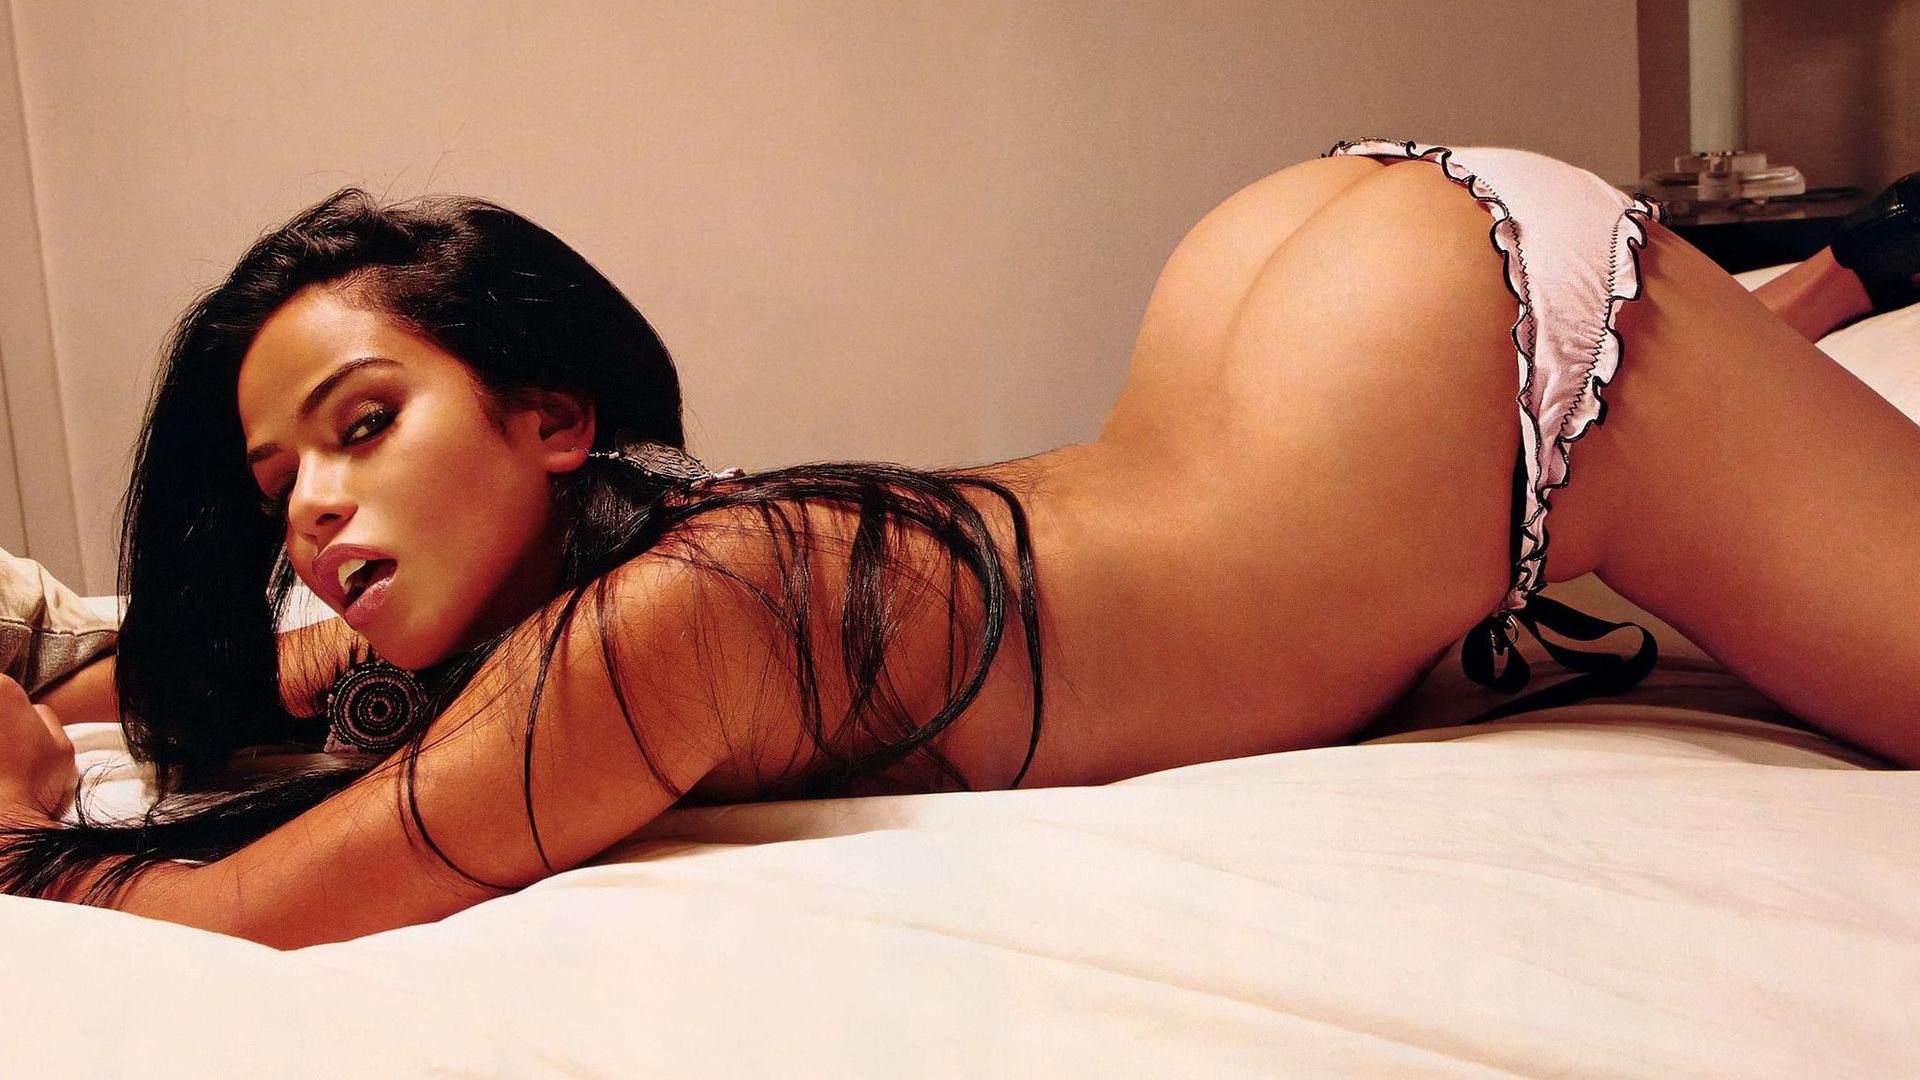 Фото фото секси дев супер порно мир